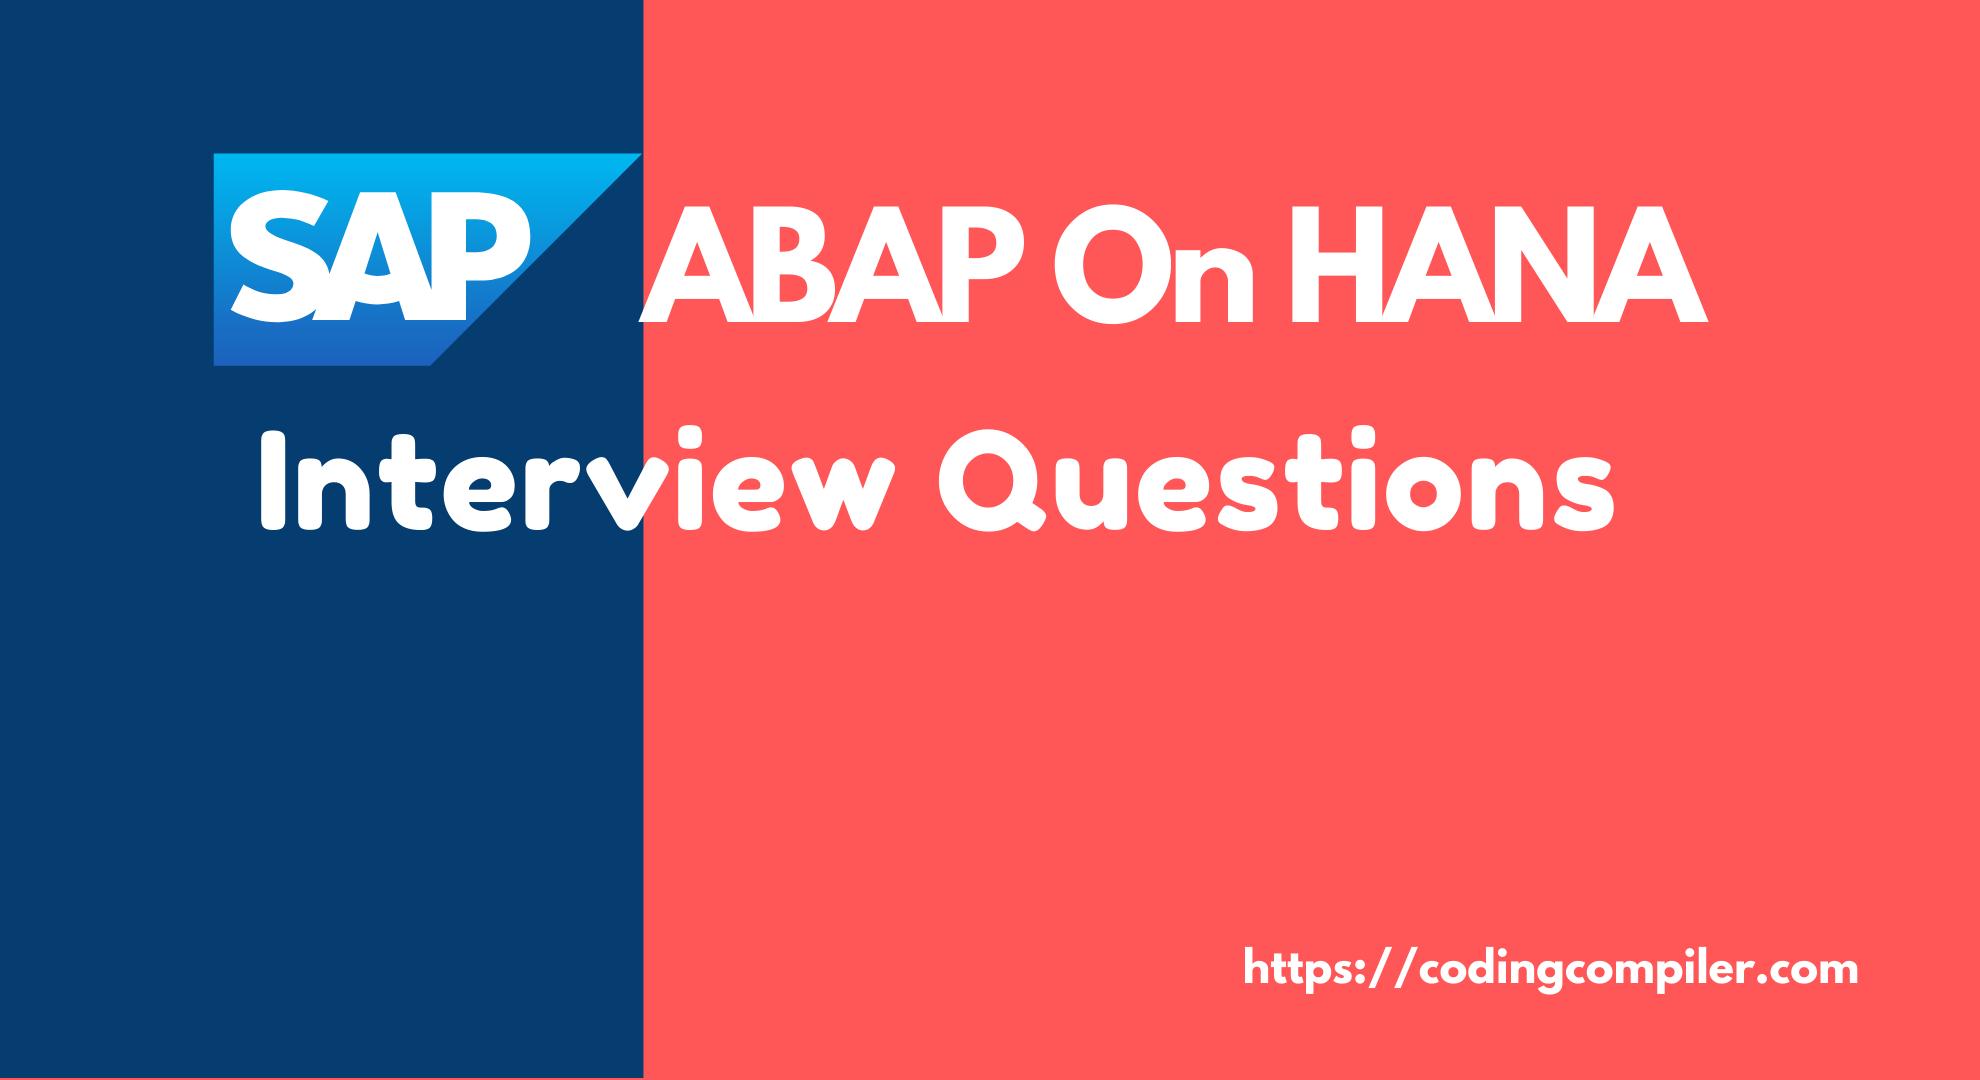 SAP ABAP on HANA Interview Questions